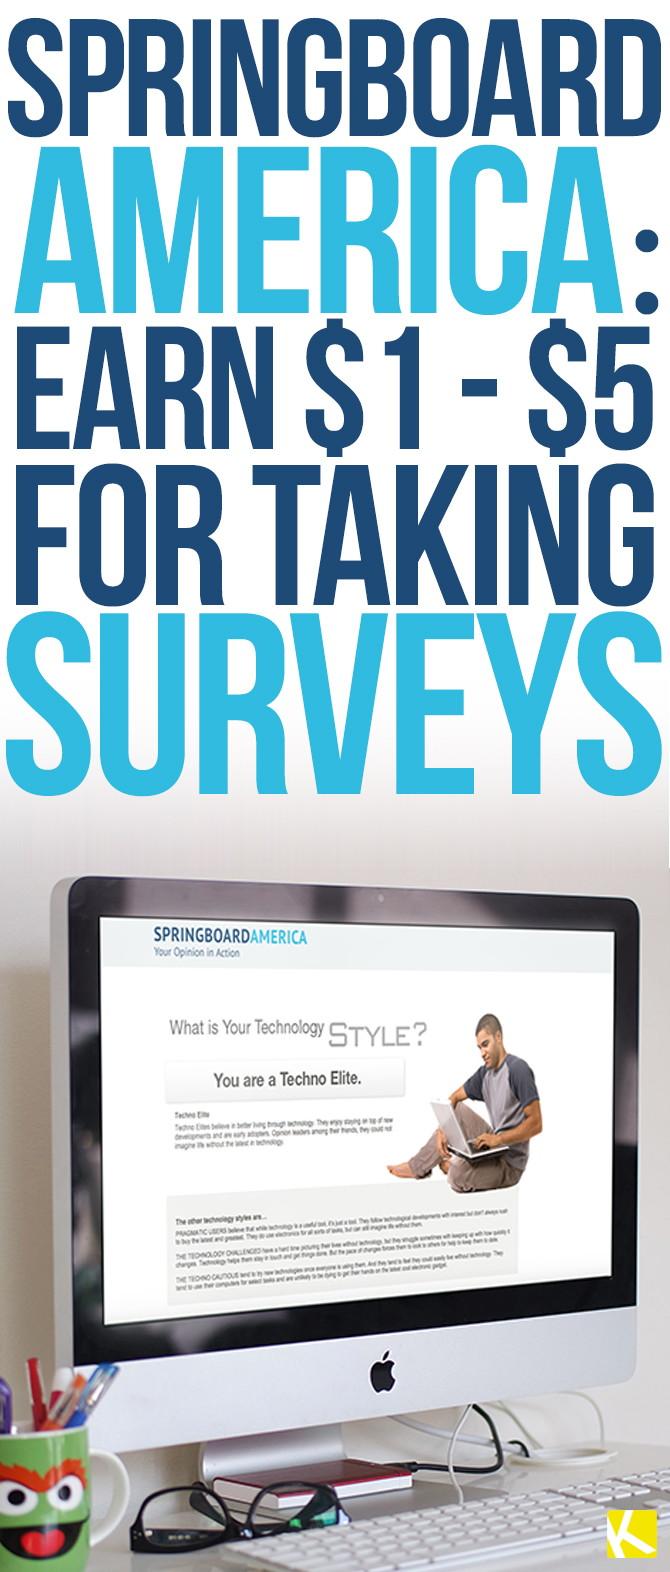 Springboard America: Earn $1 – $5 for Taking Surveys